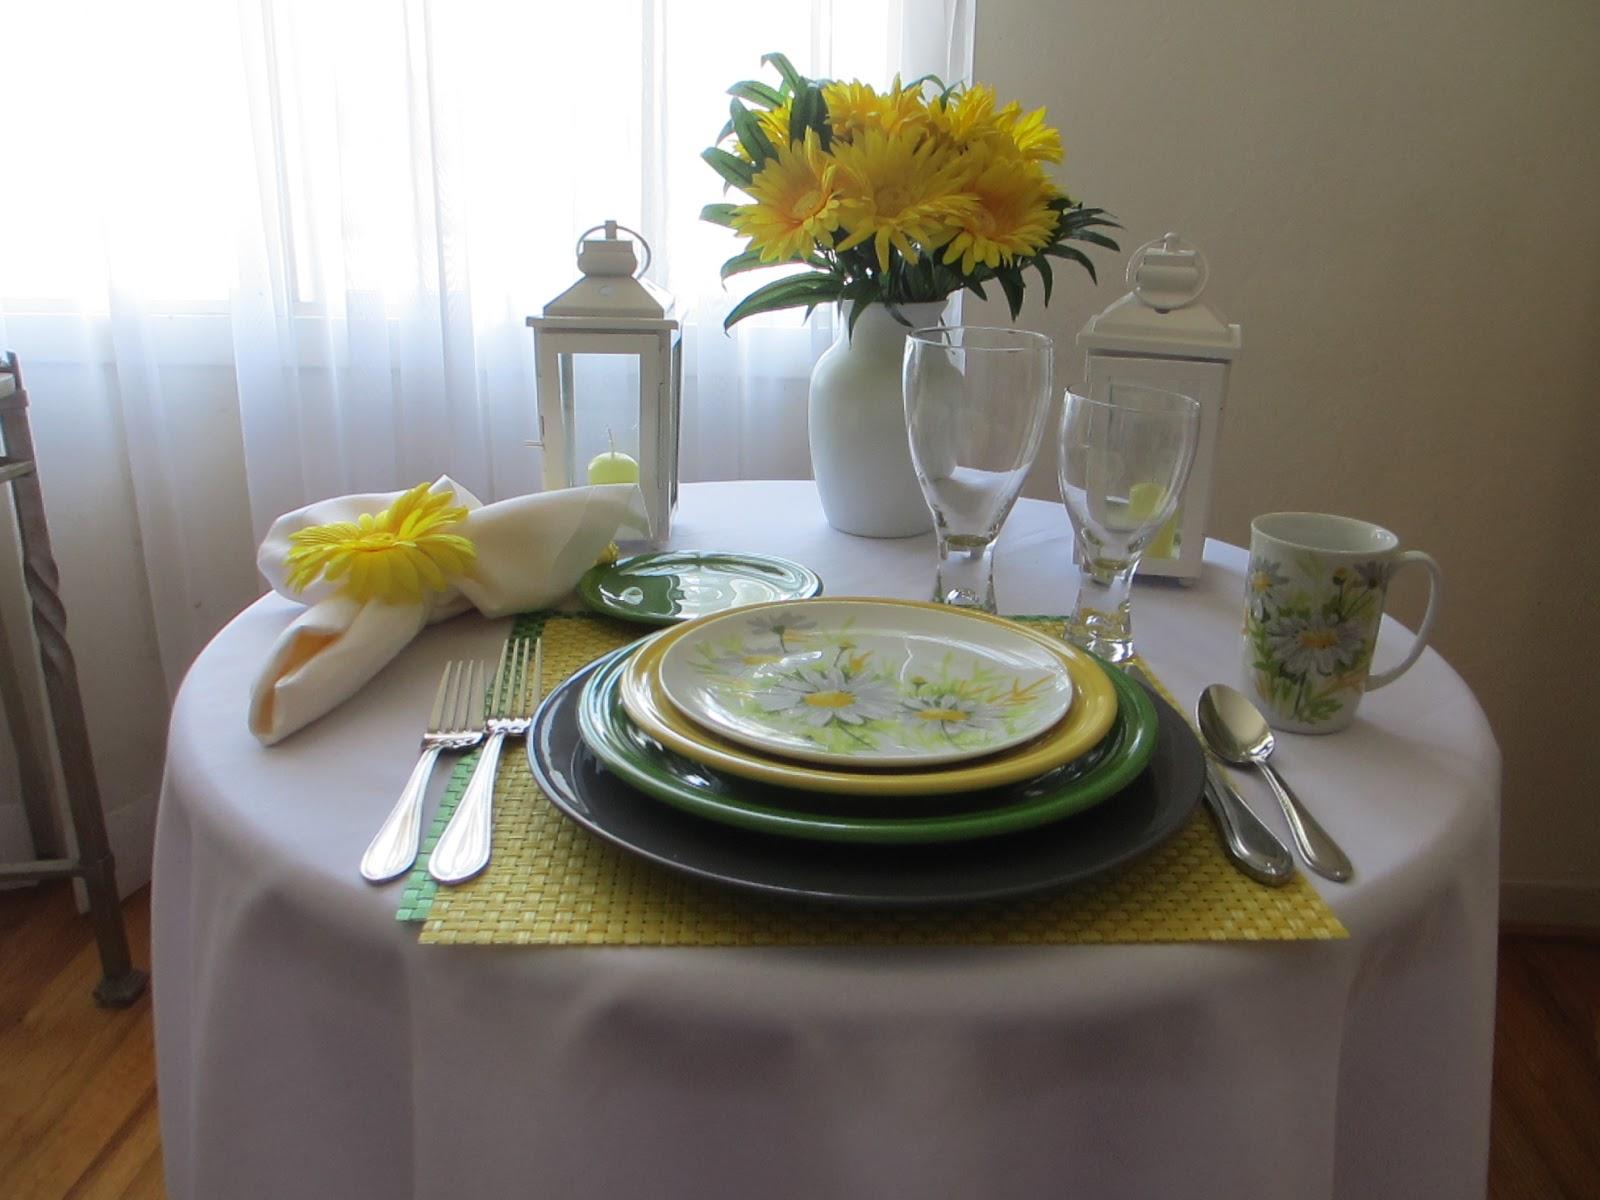 Fiestaware And Daisies